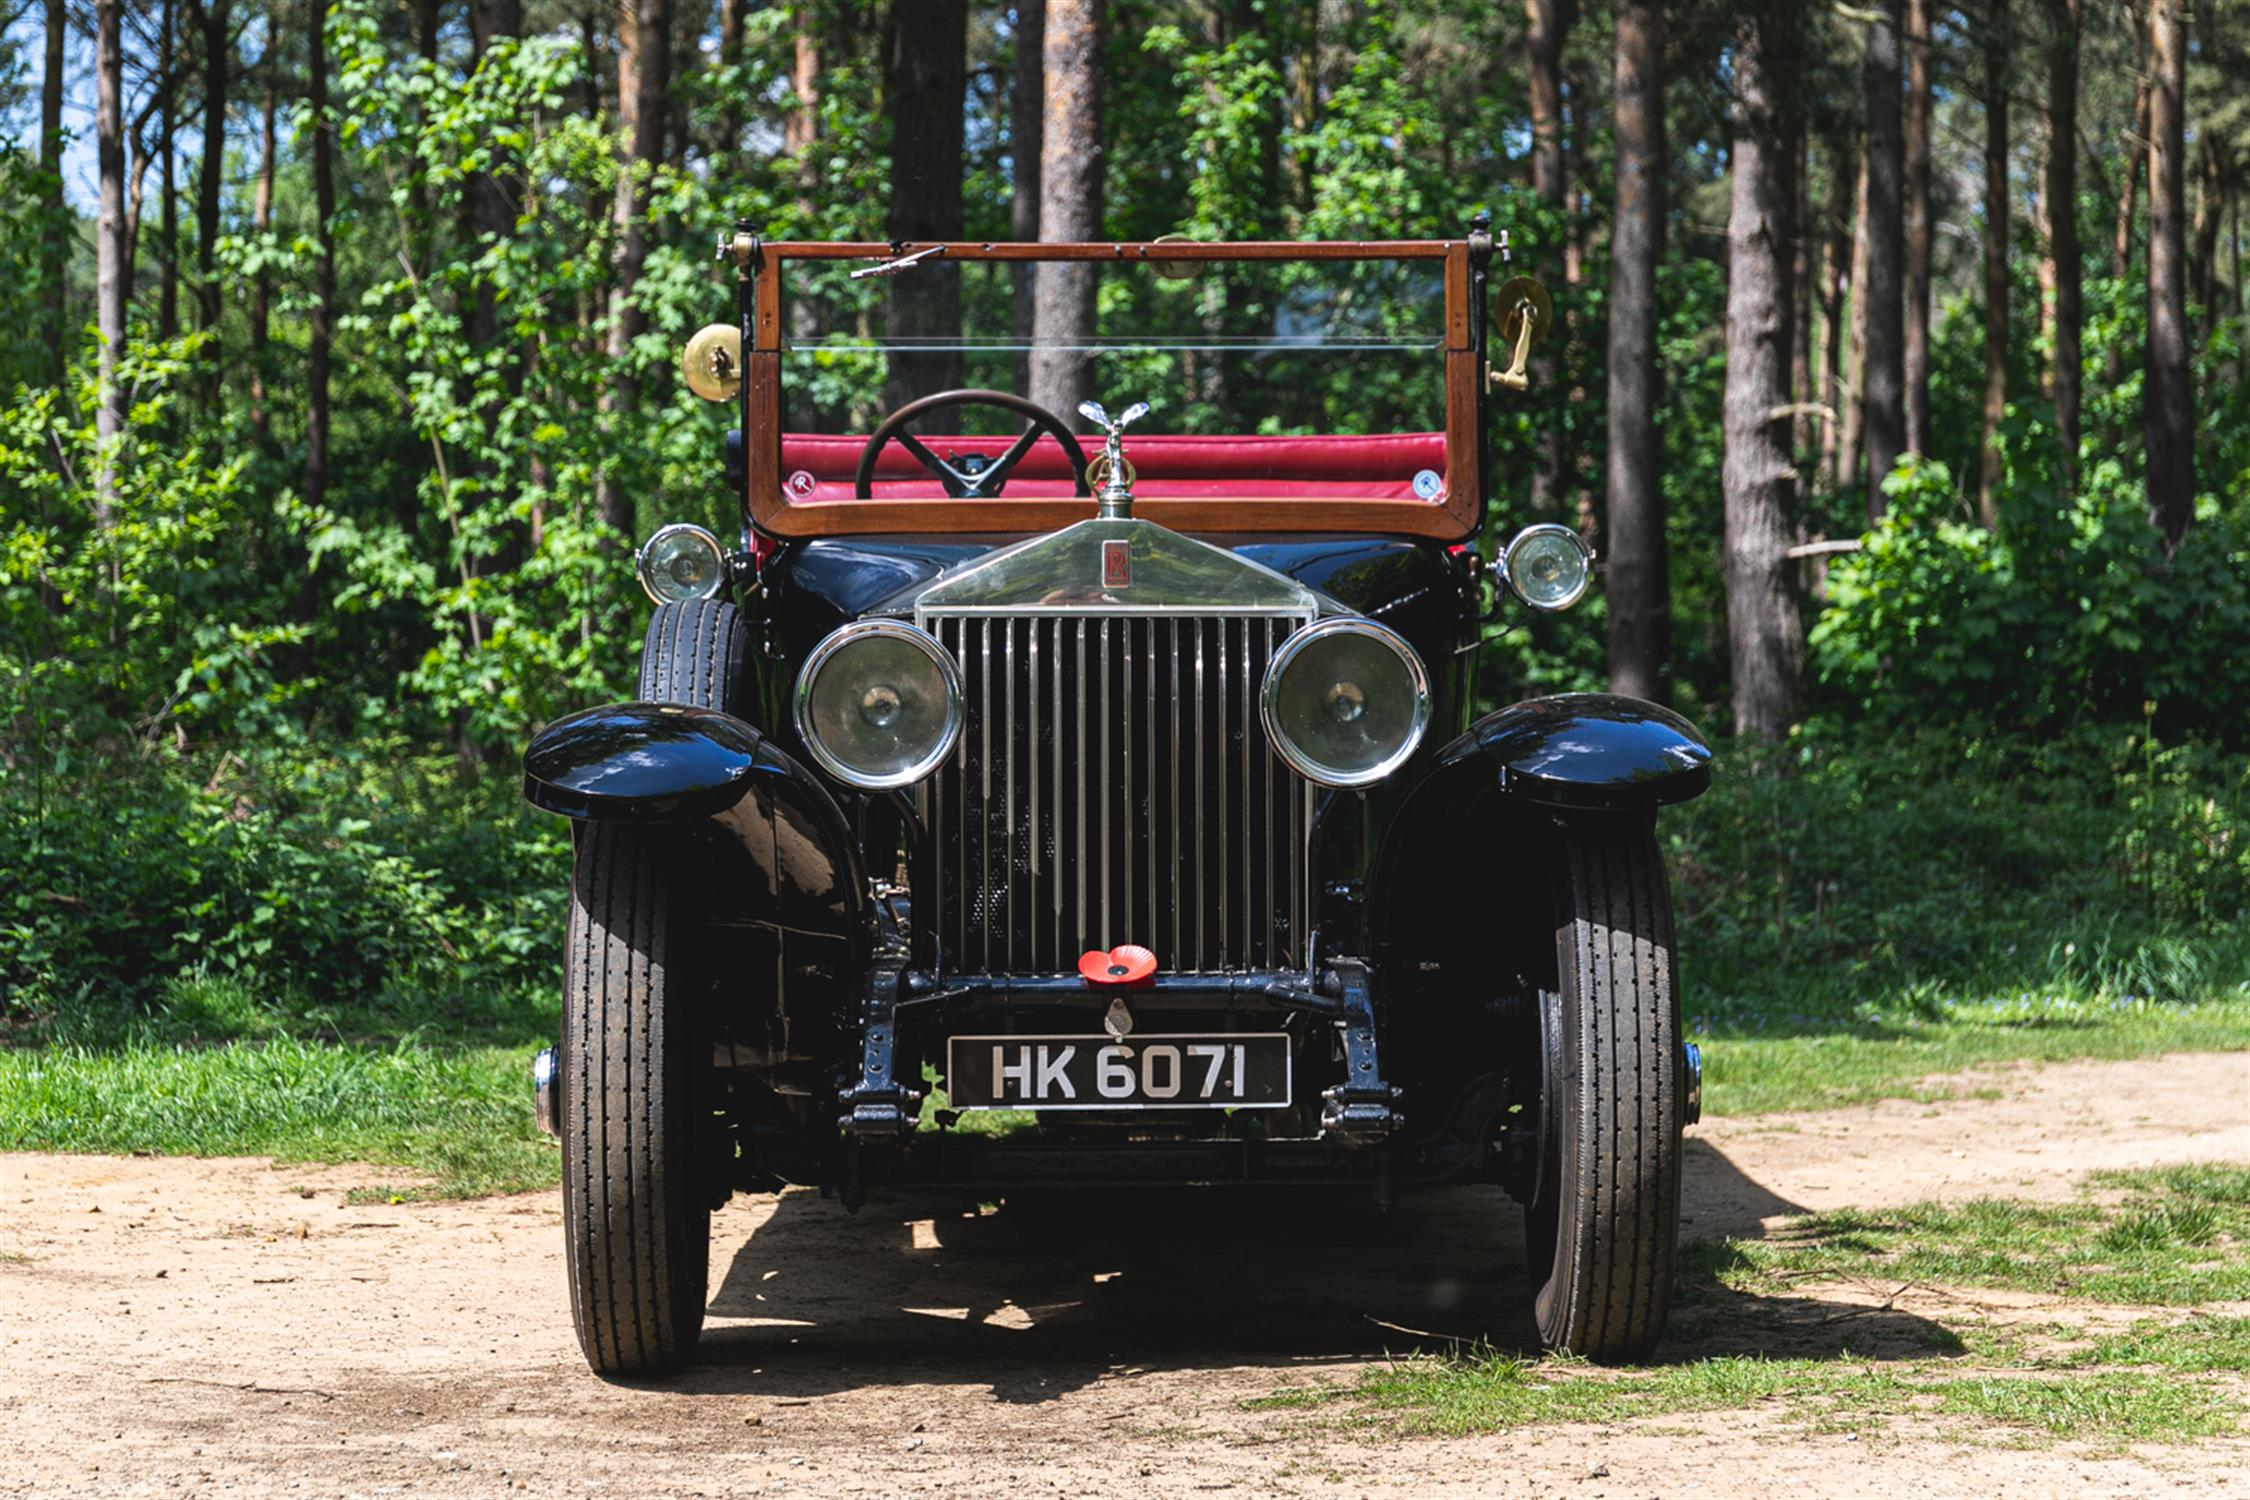 1927 Rolls-Royce Phantom 1 Open Tourer - Image 6 of 10